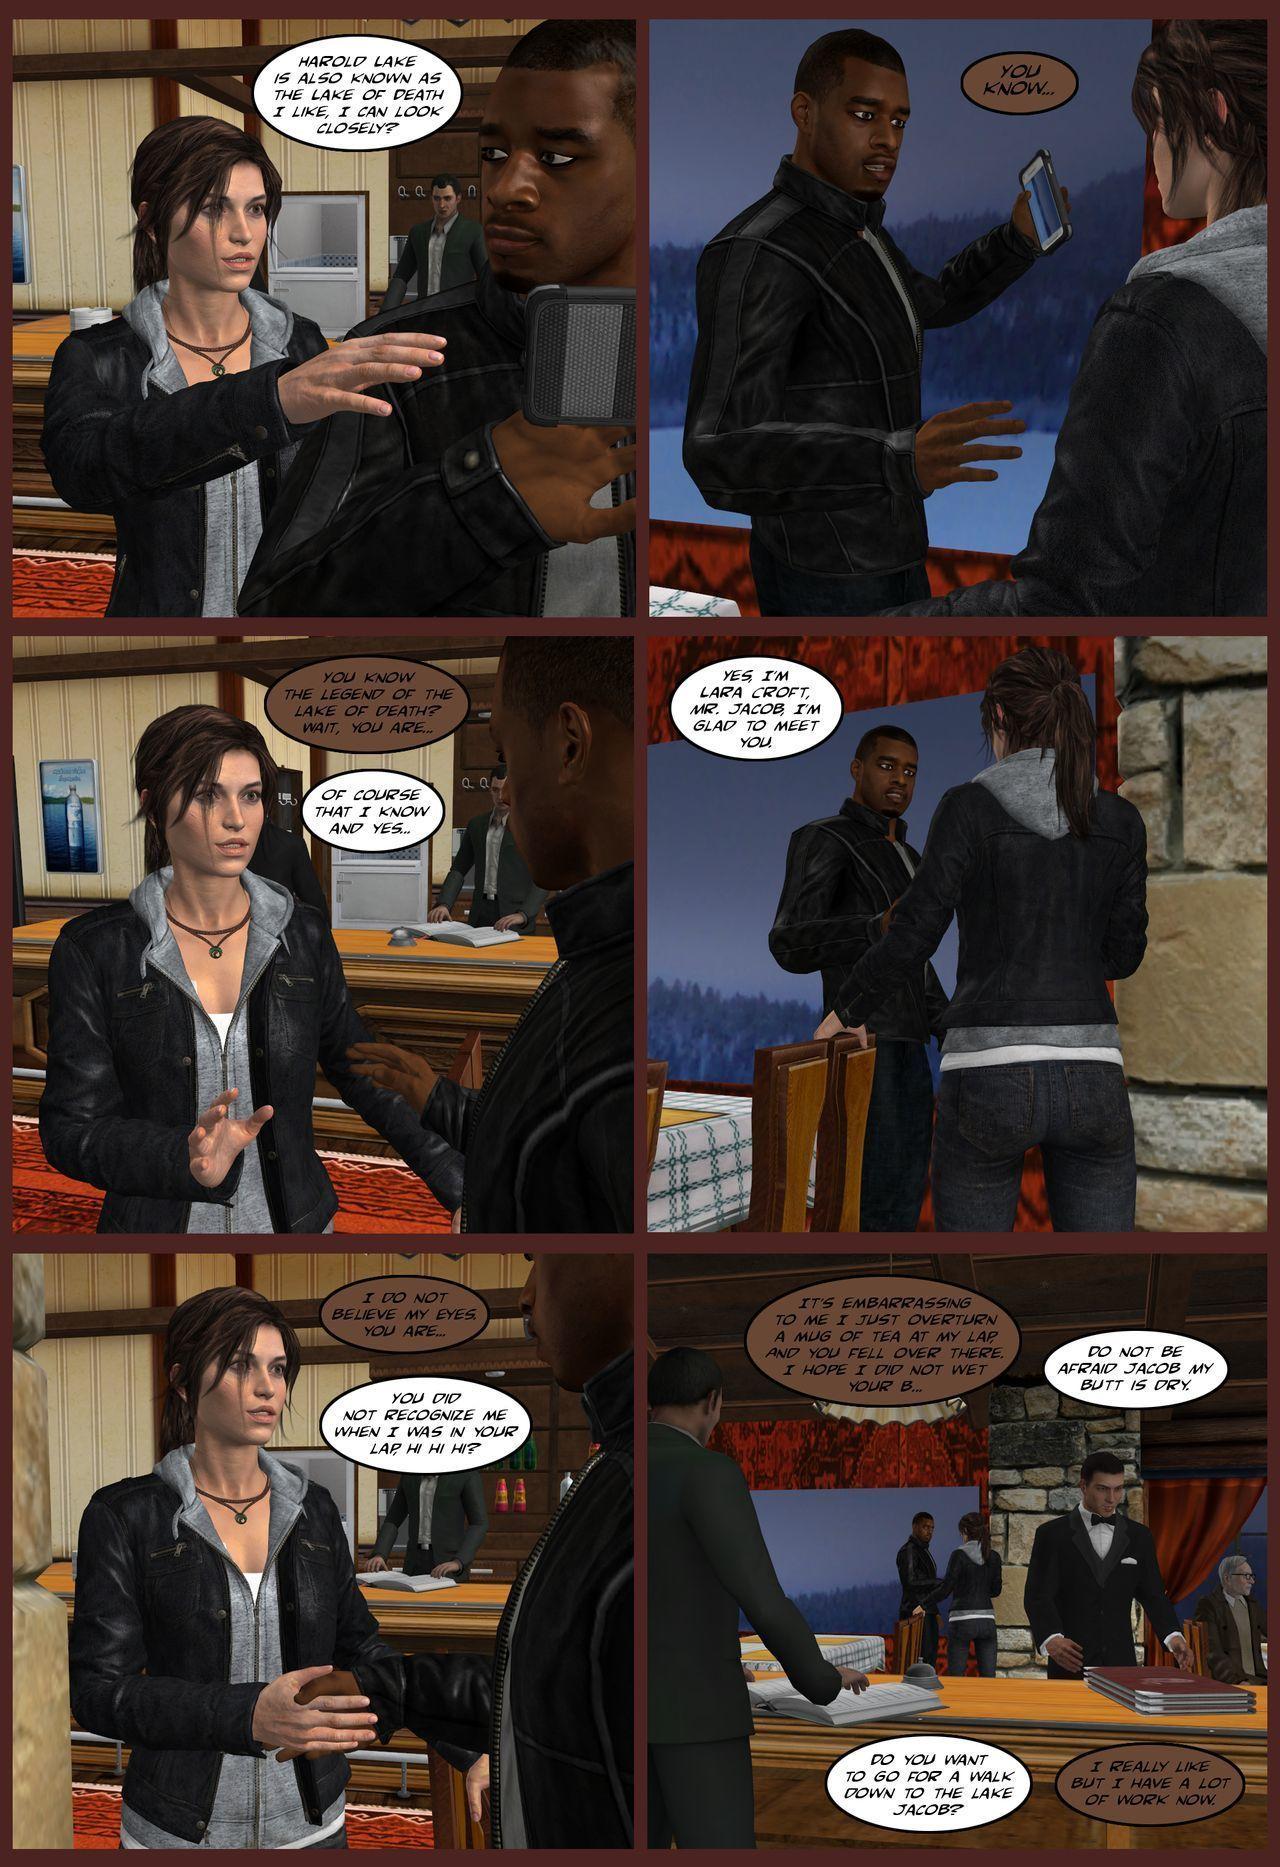 Adventures of Hostel - chapter 1-2 - part 3